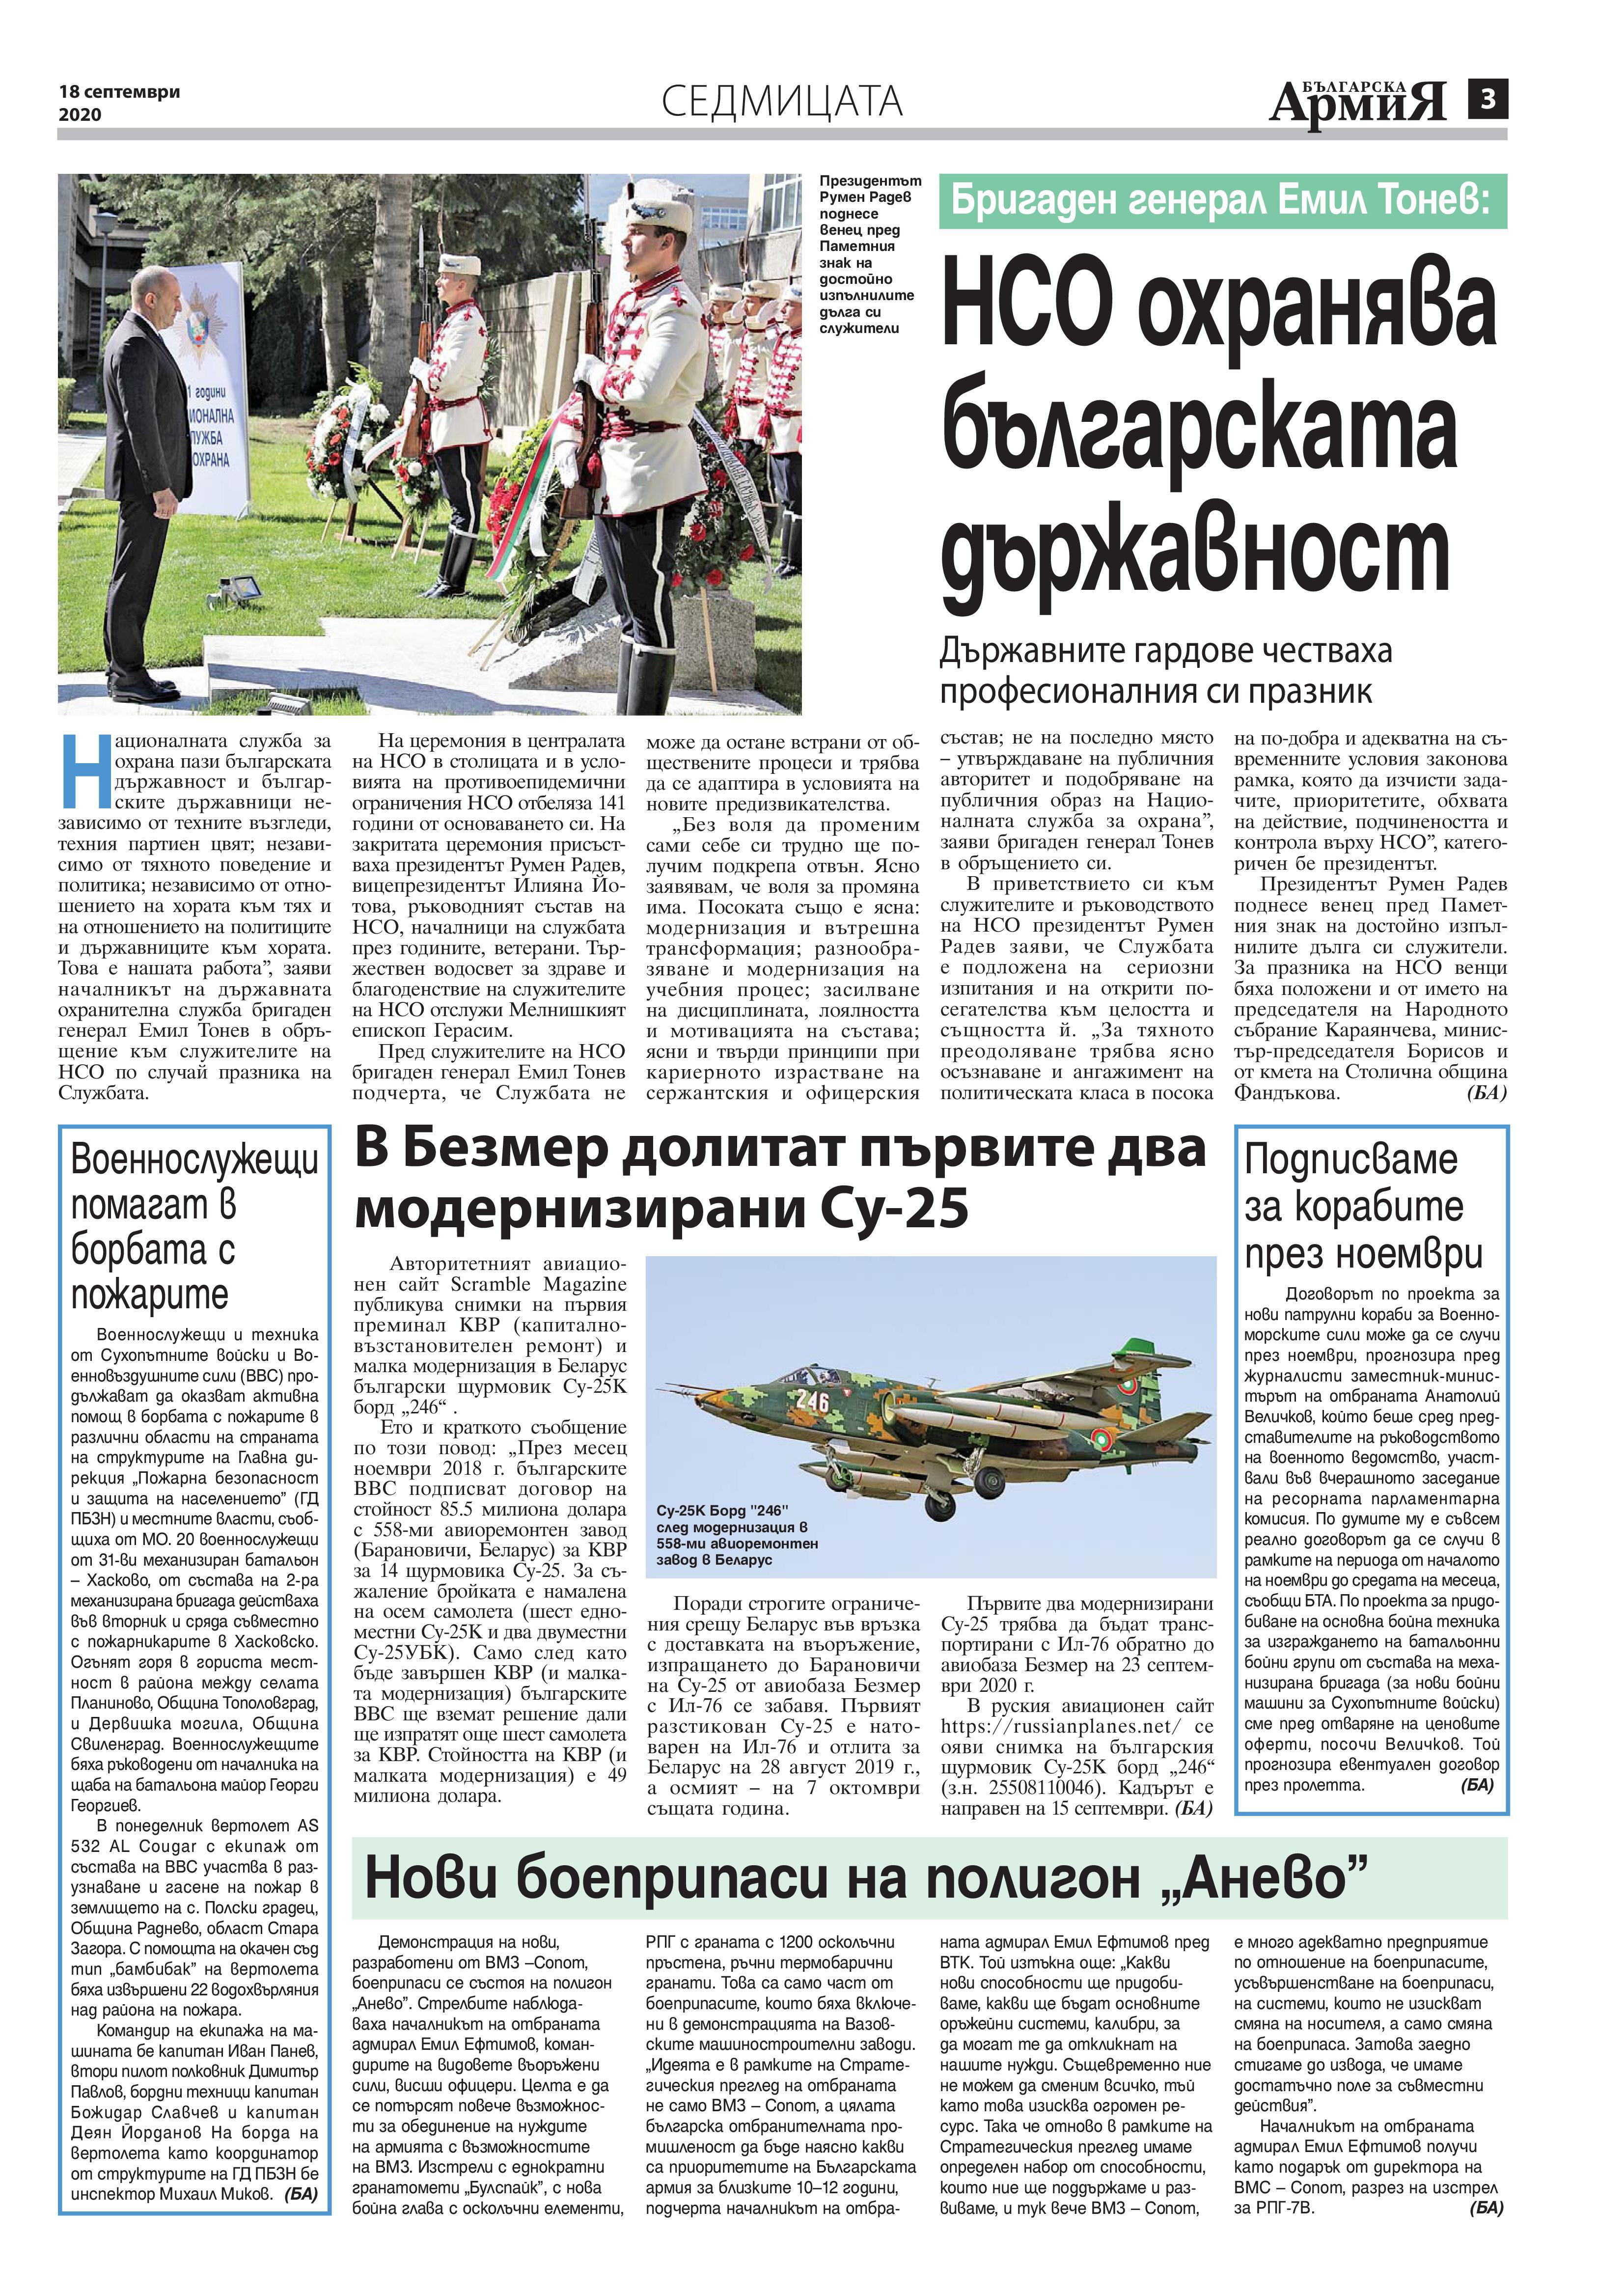 https://armymedia.bg/wp-content/uploads/2015/06/03-40.jpg